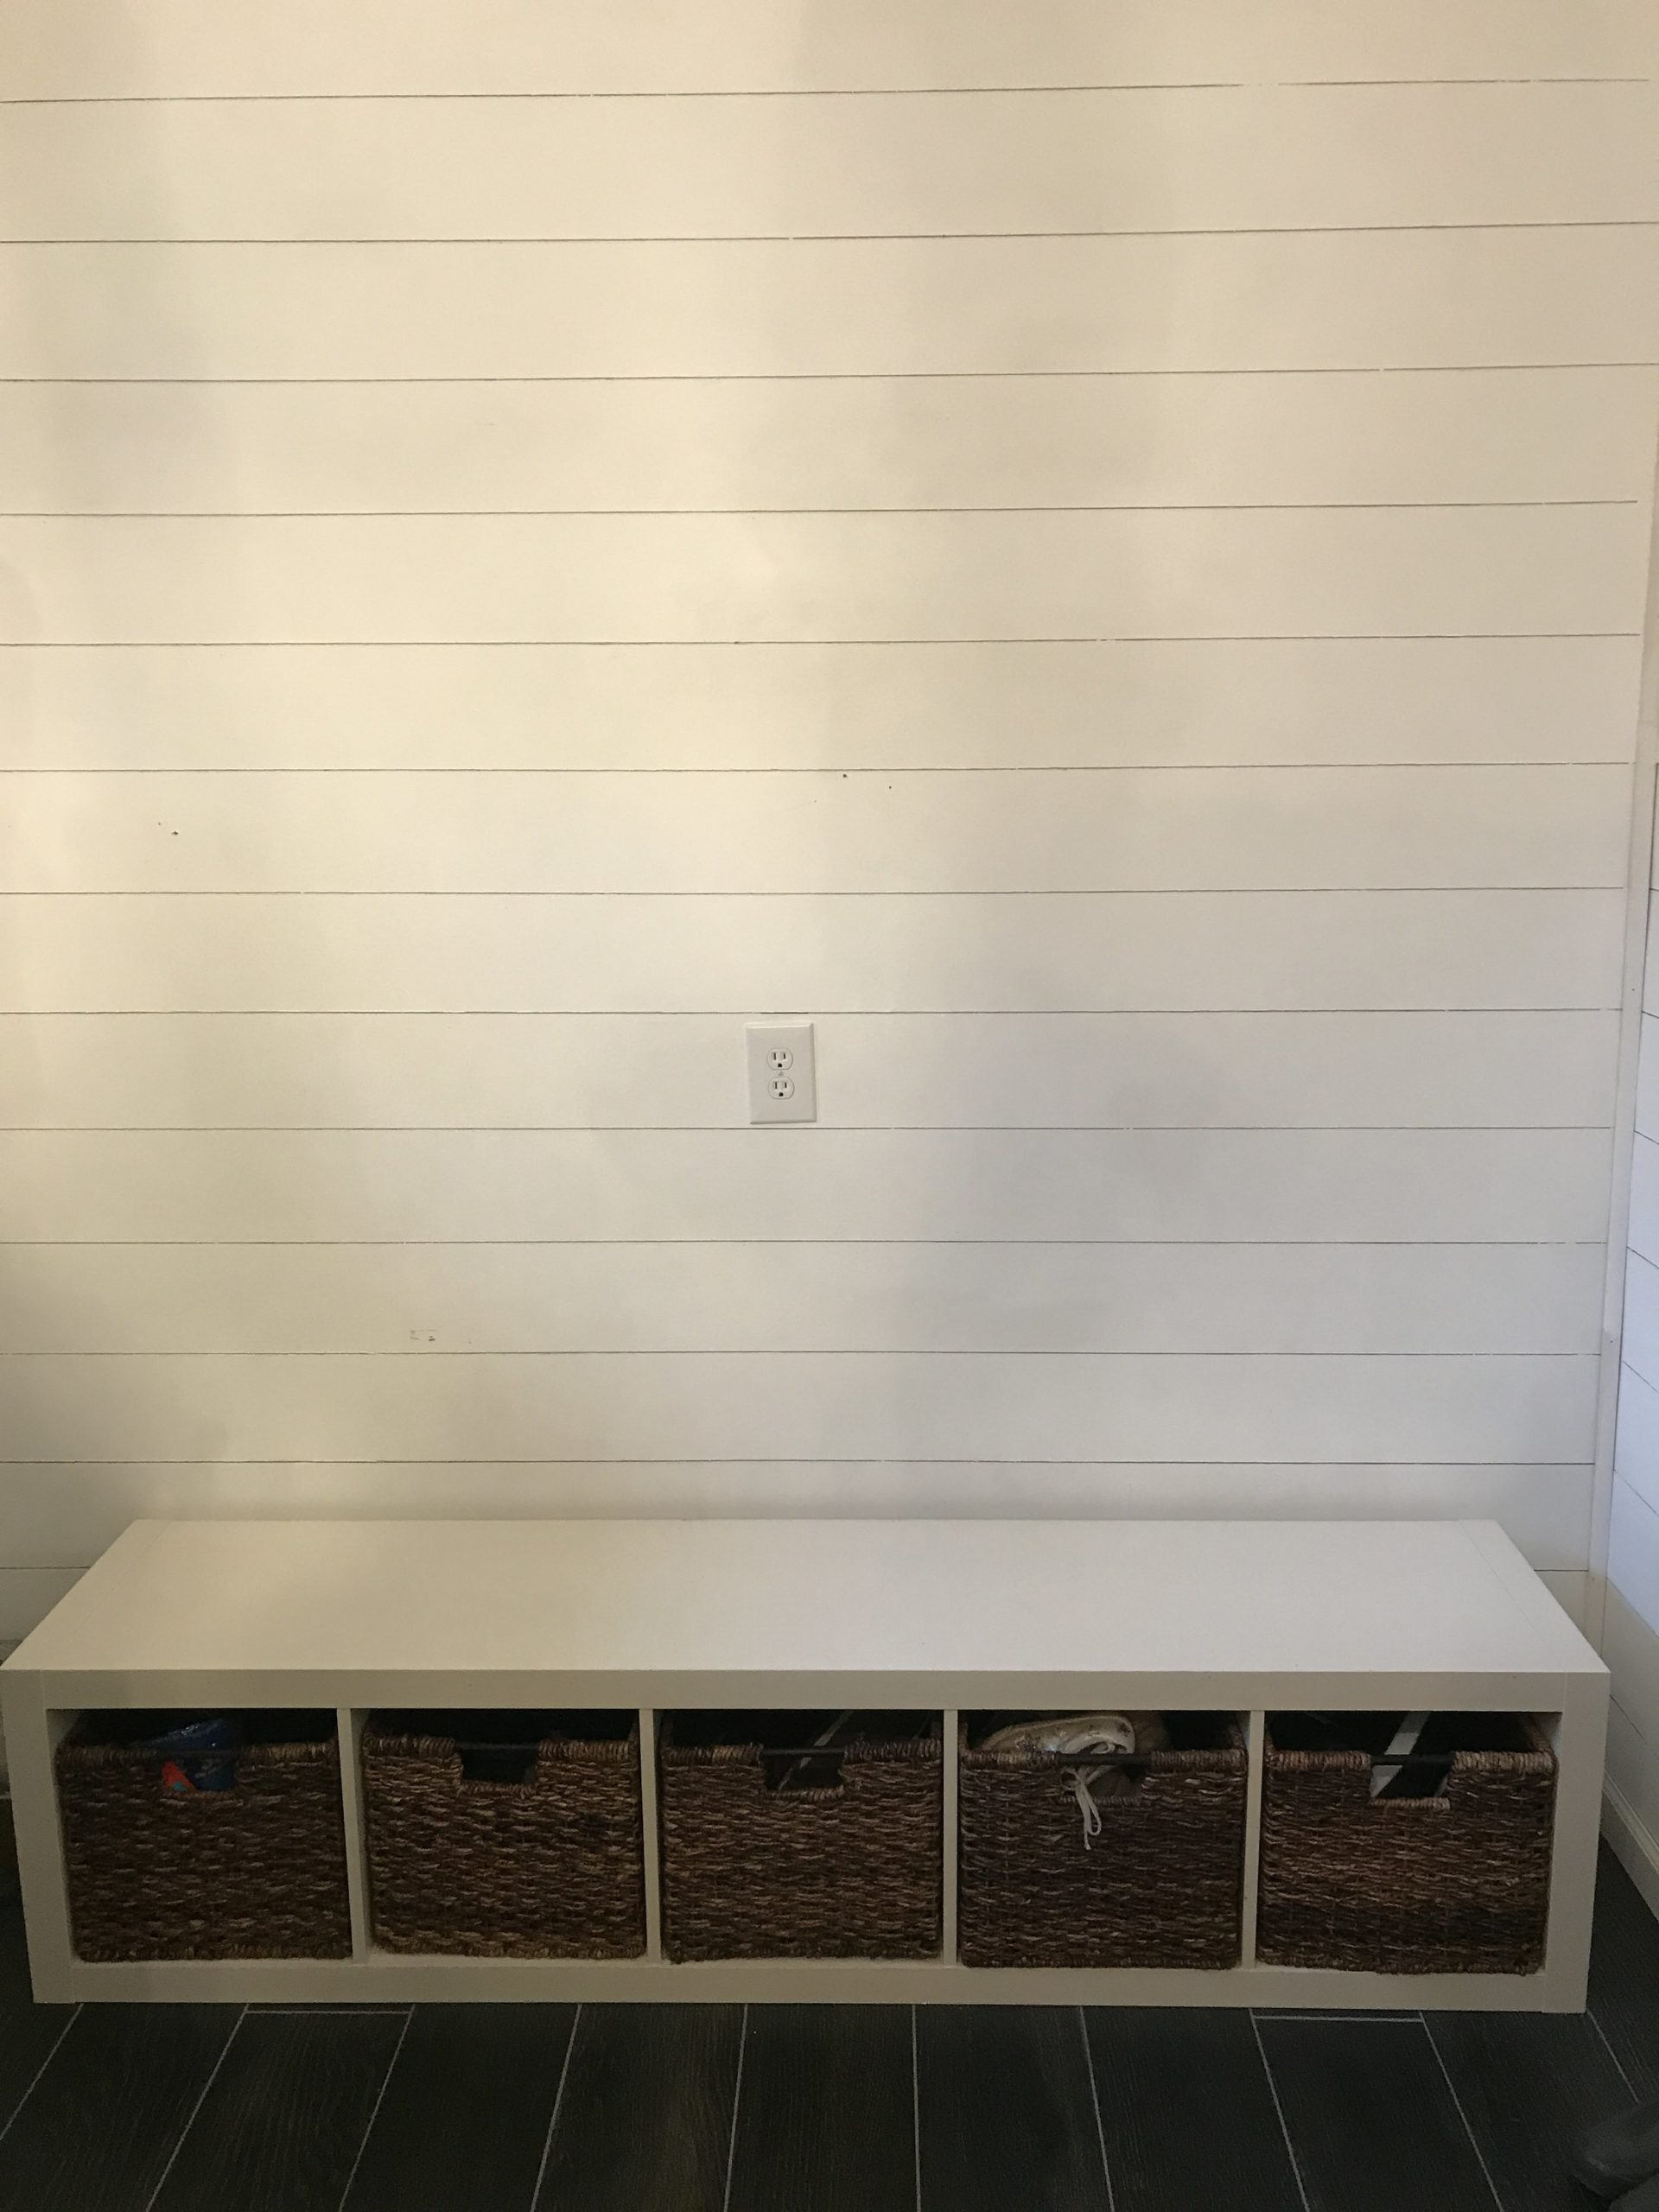 Ikea Hack Diy Mudroom Bench Built In Dreaming Of Homemaking